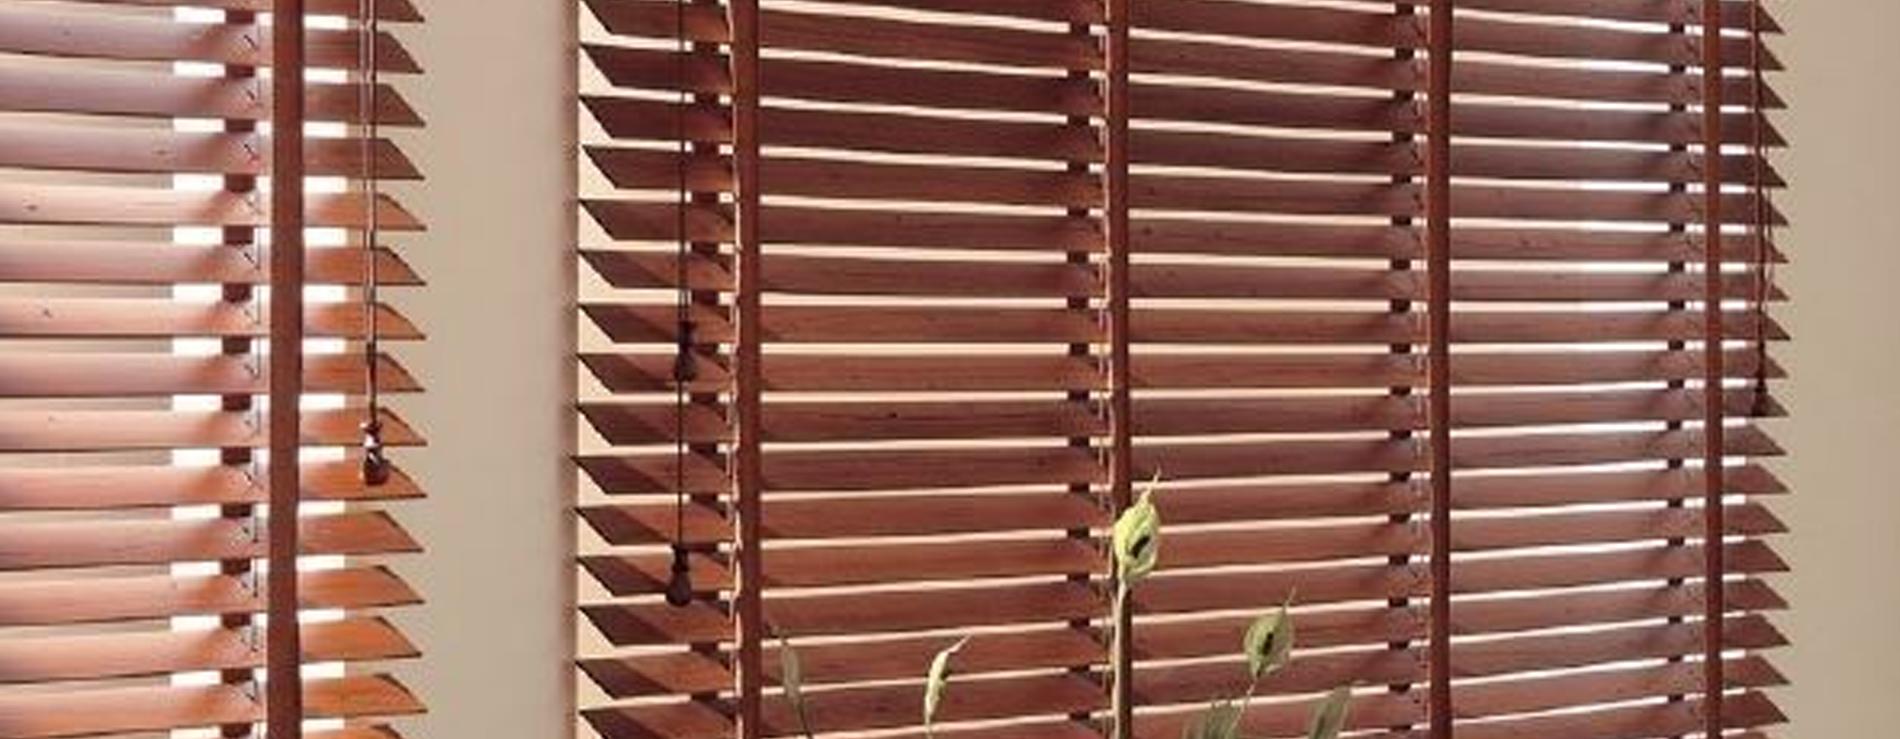 Veneziane in legno mottura centro mobili - Tende veneziane in legno ikea ...